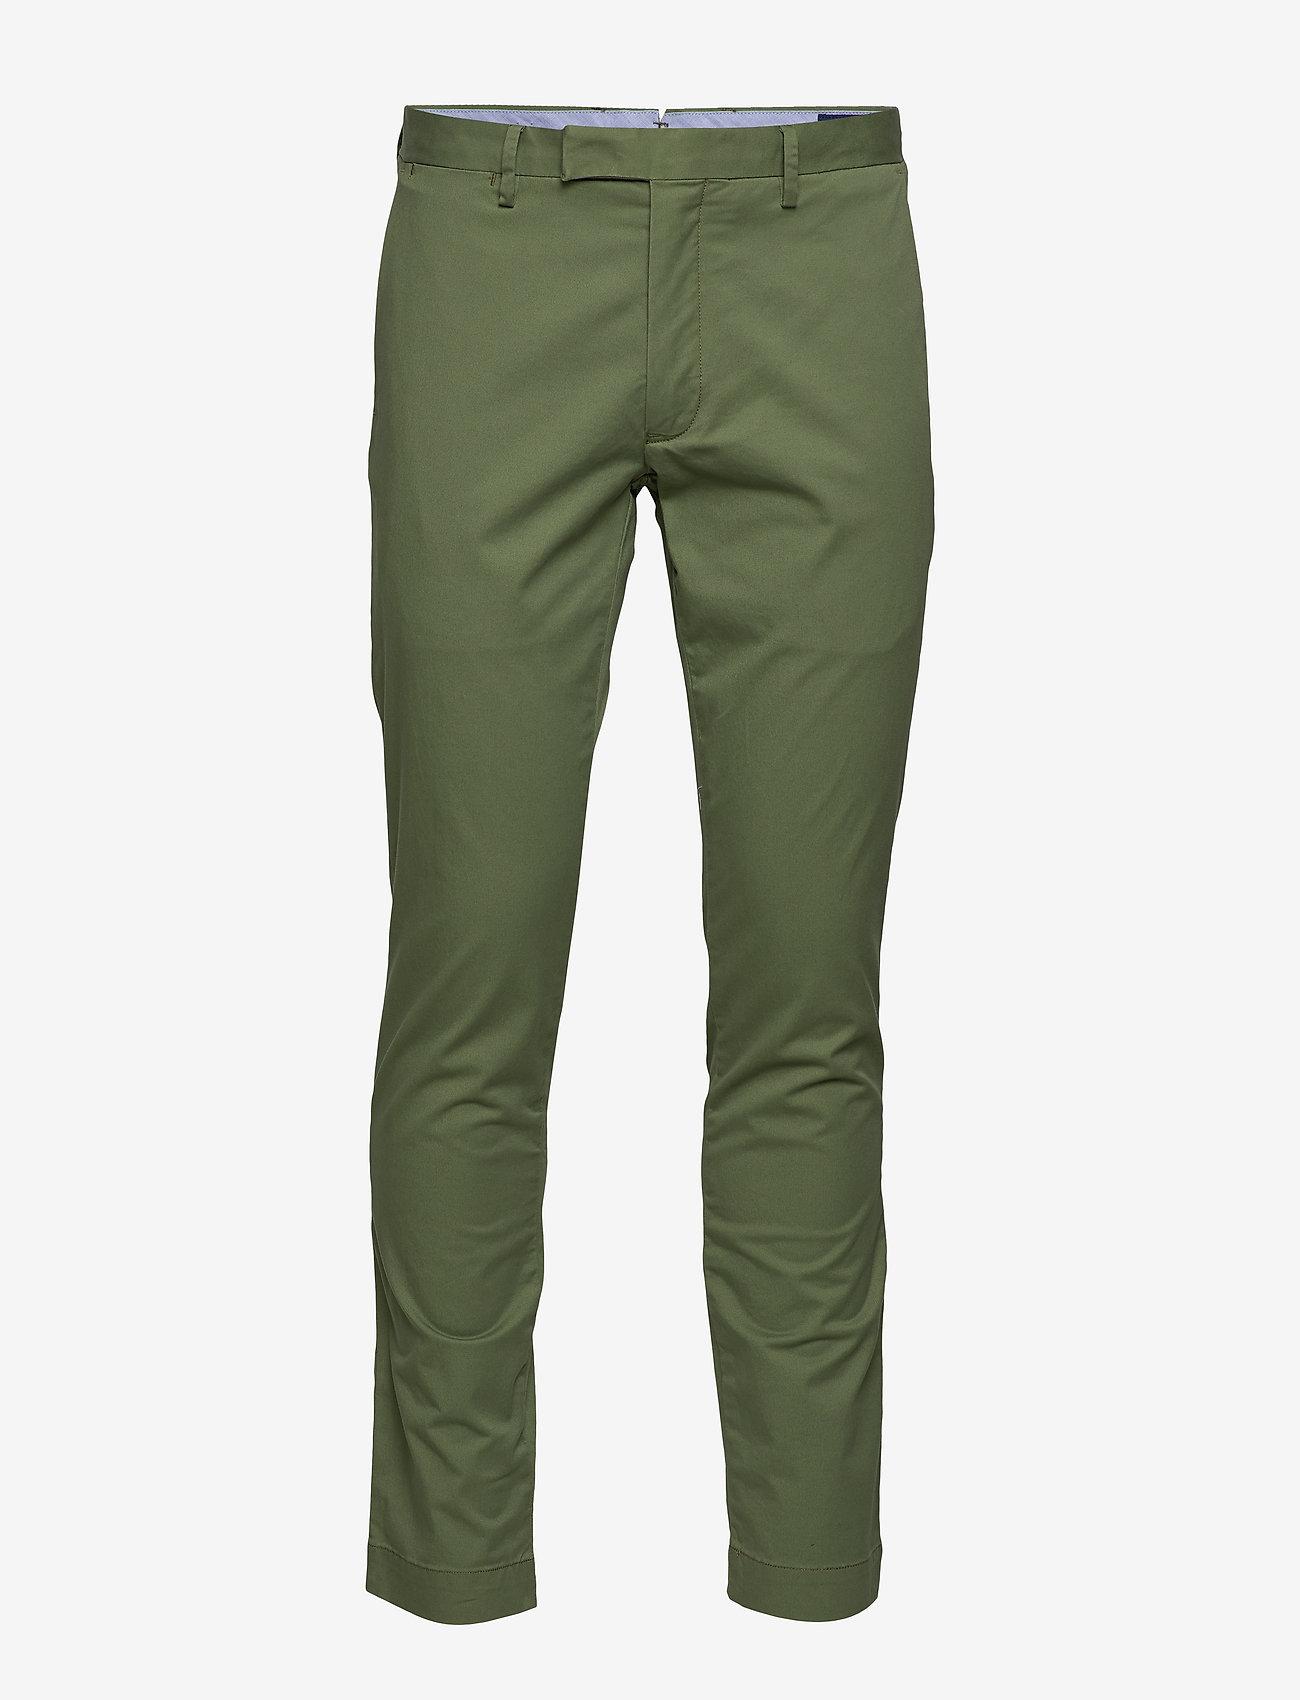 Polo Ralph Lauren - Stretch Tailored Slim Chino - spodnie na co dzień - army olive - 0